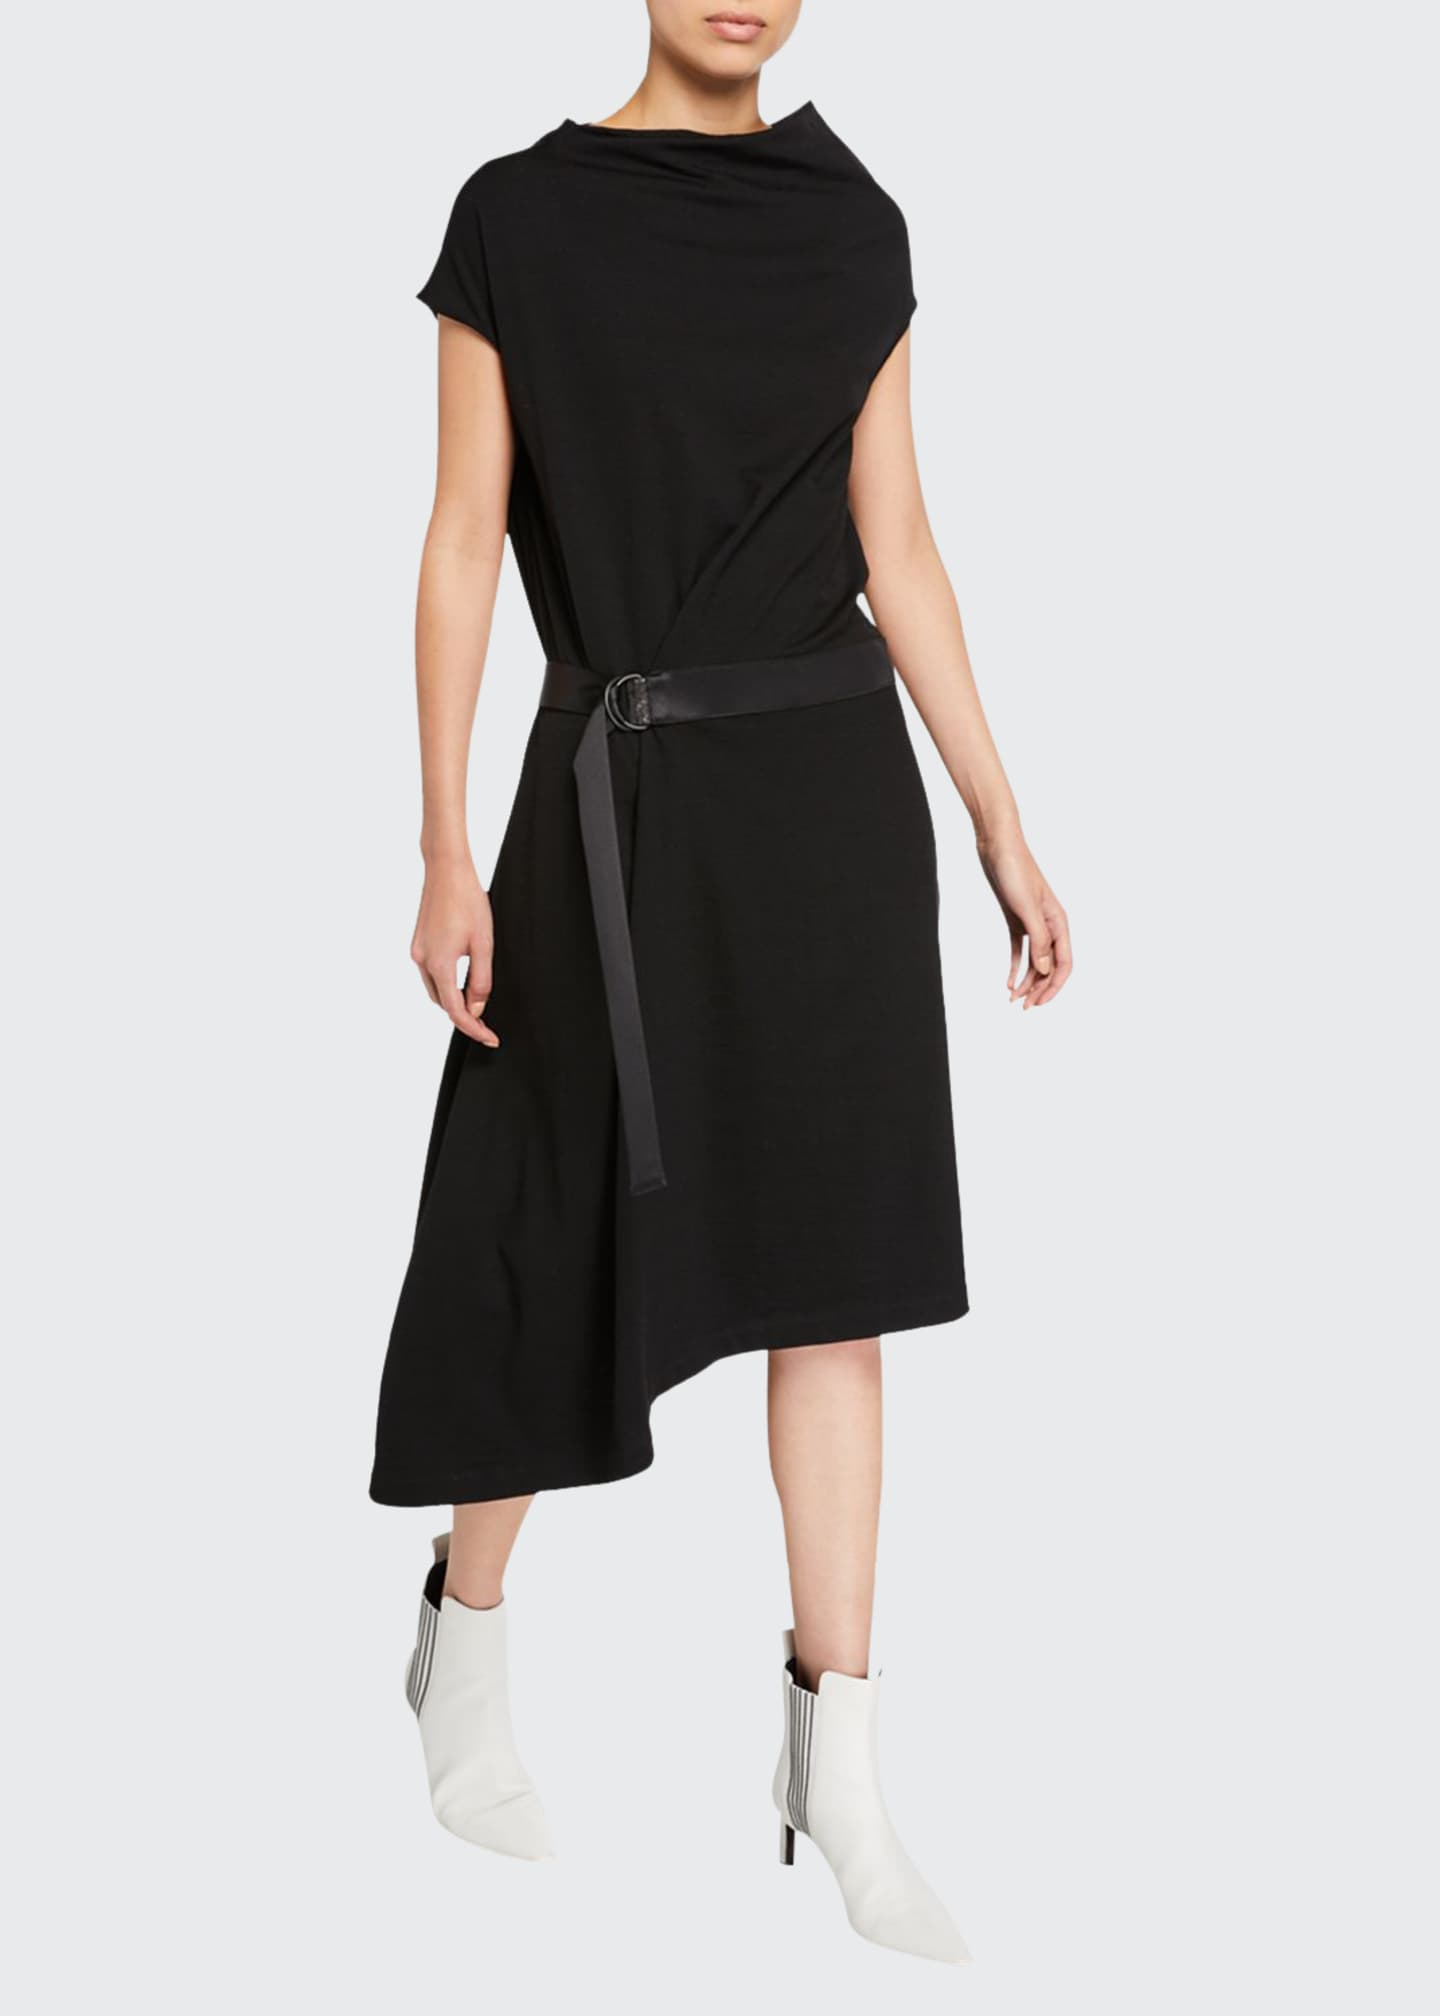 Brunello Cucinelli Cowl-Neck Crepe Asymmetric Dress